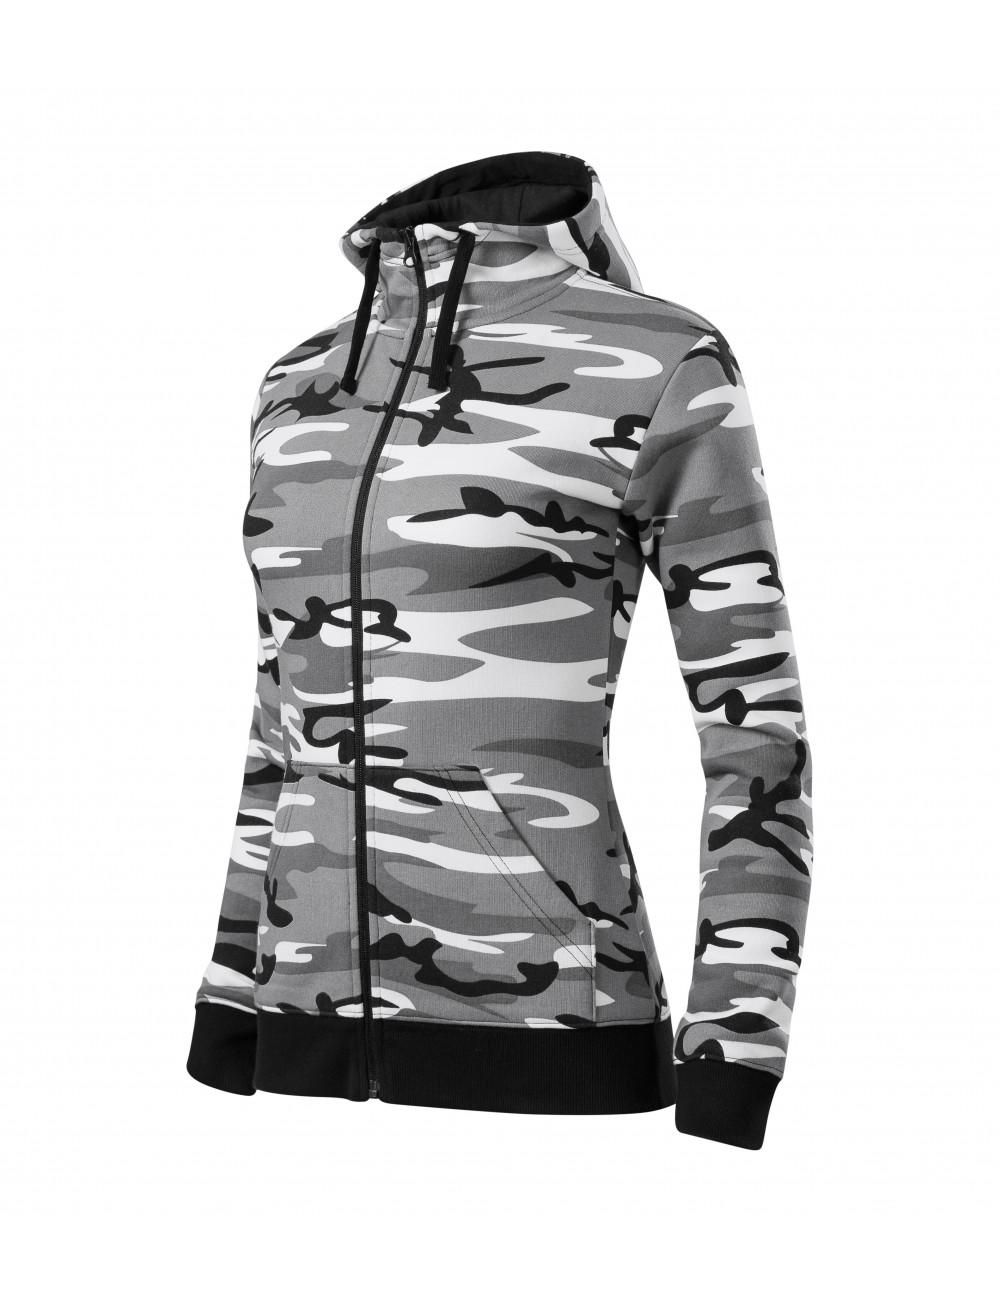 Adler MALFINI Bluza damska Camo Zipper C20 camouflage gray